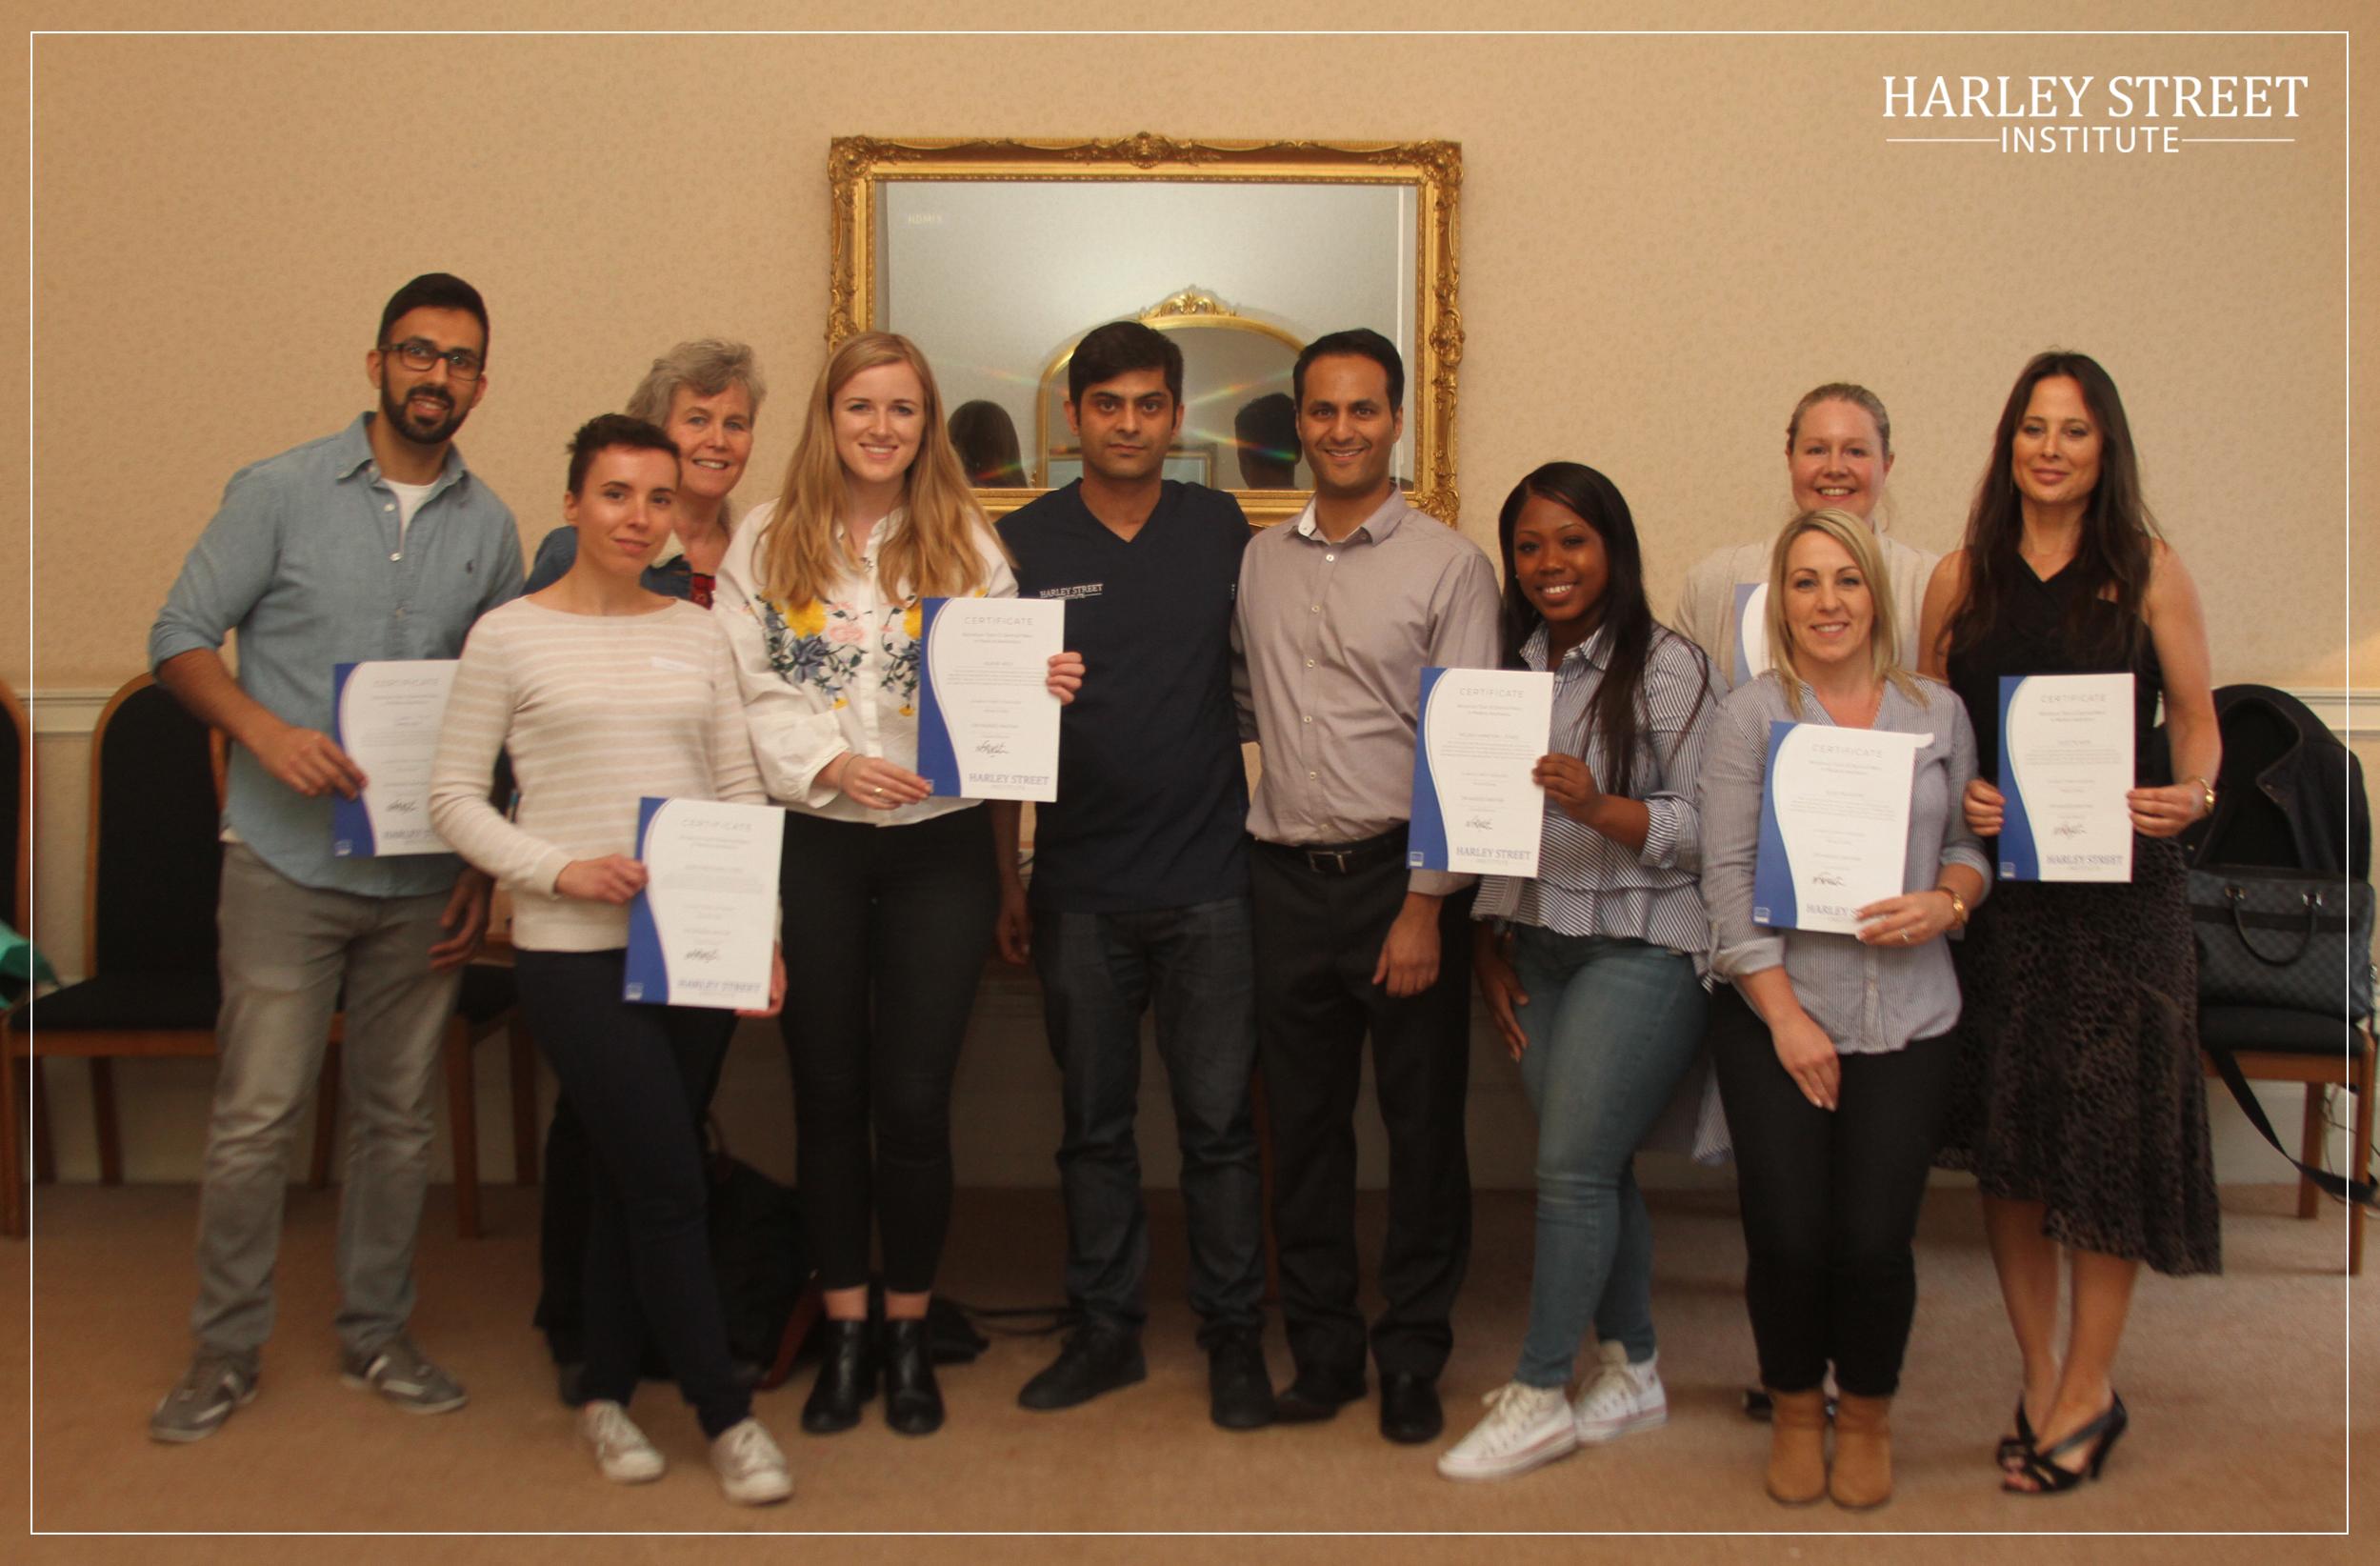 HSI trainee group